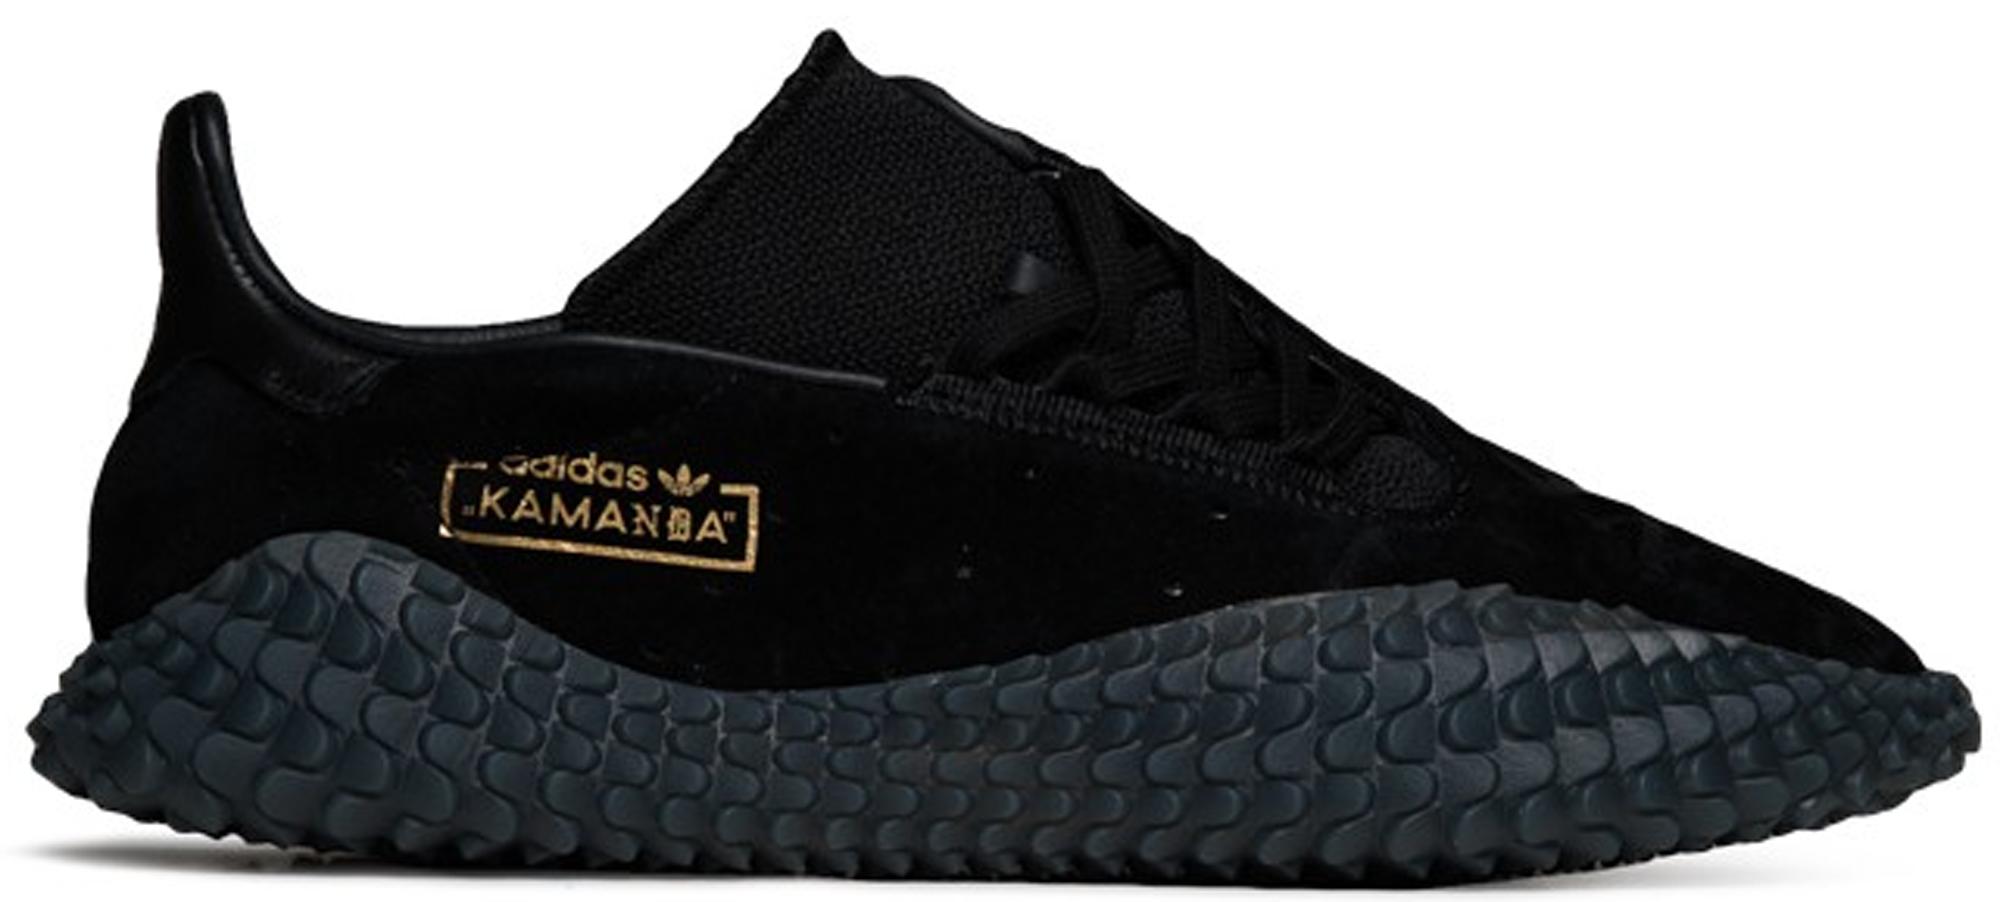 adidas Kamanda Neighborhood Black